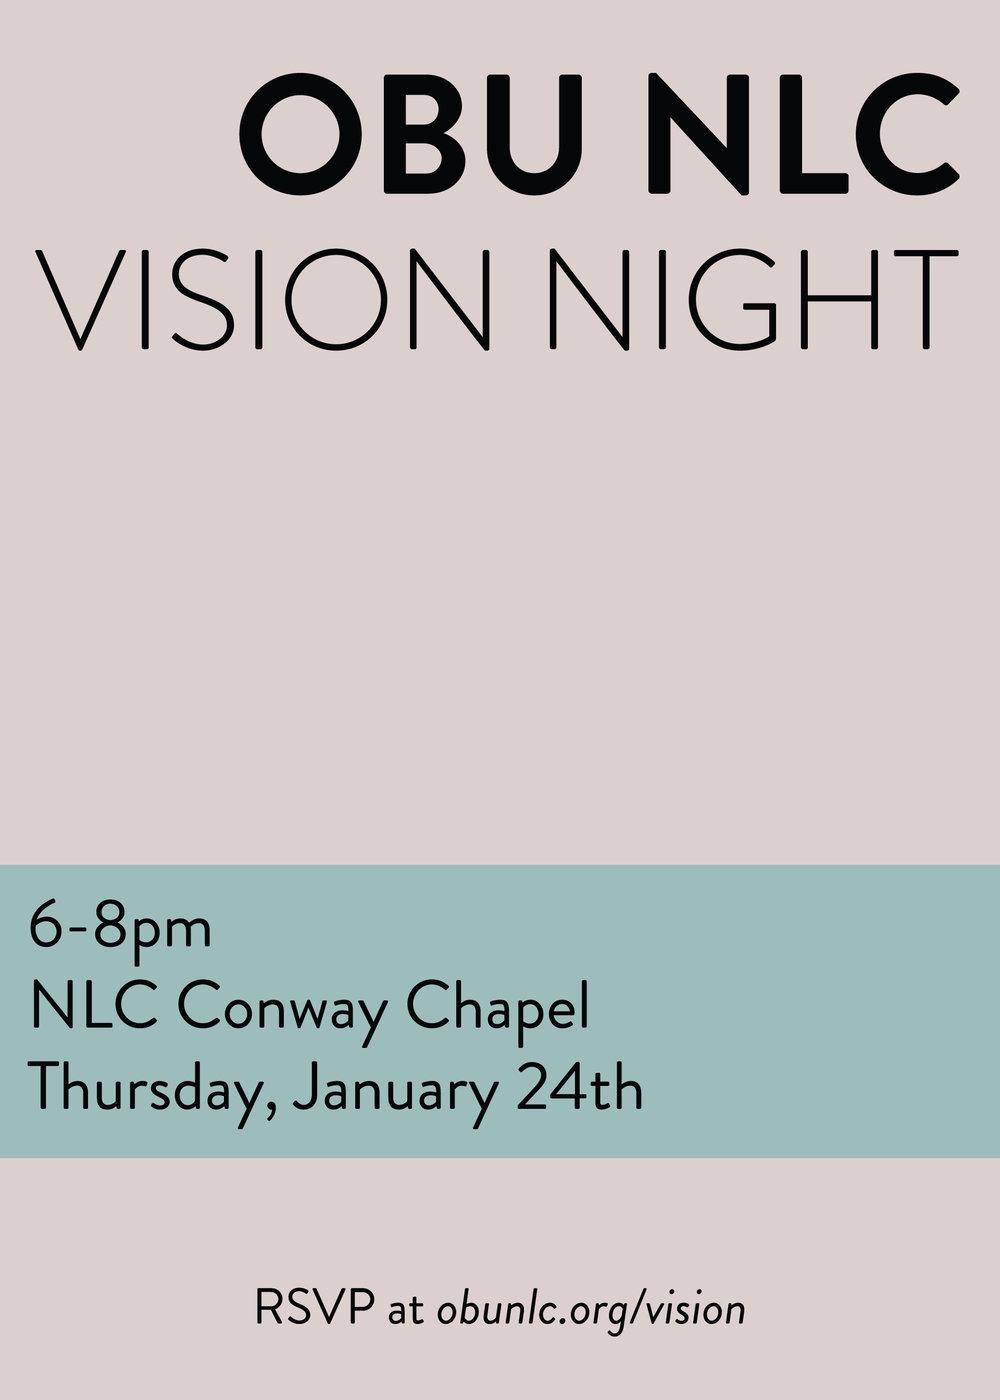 OBUNLC-Vision-Night-DIgital.jpg